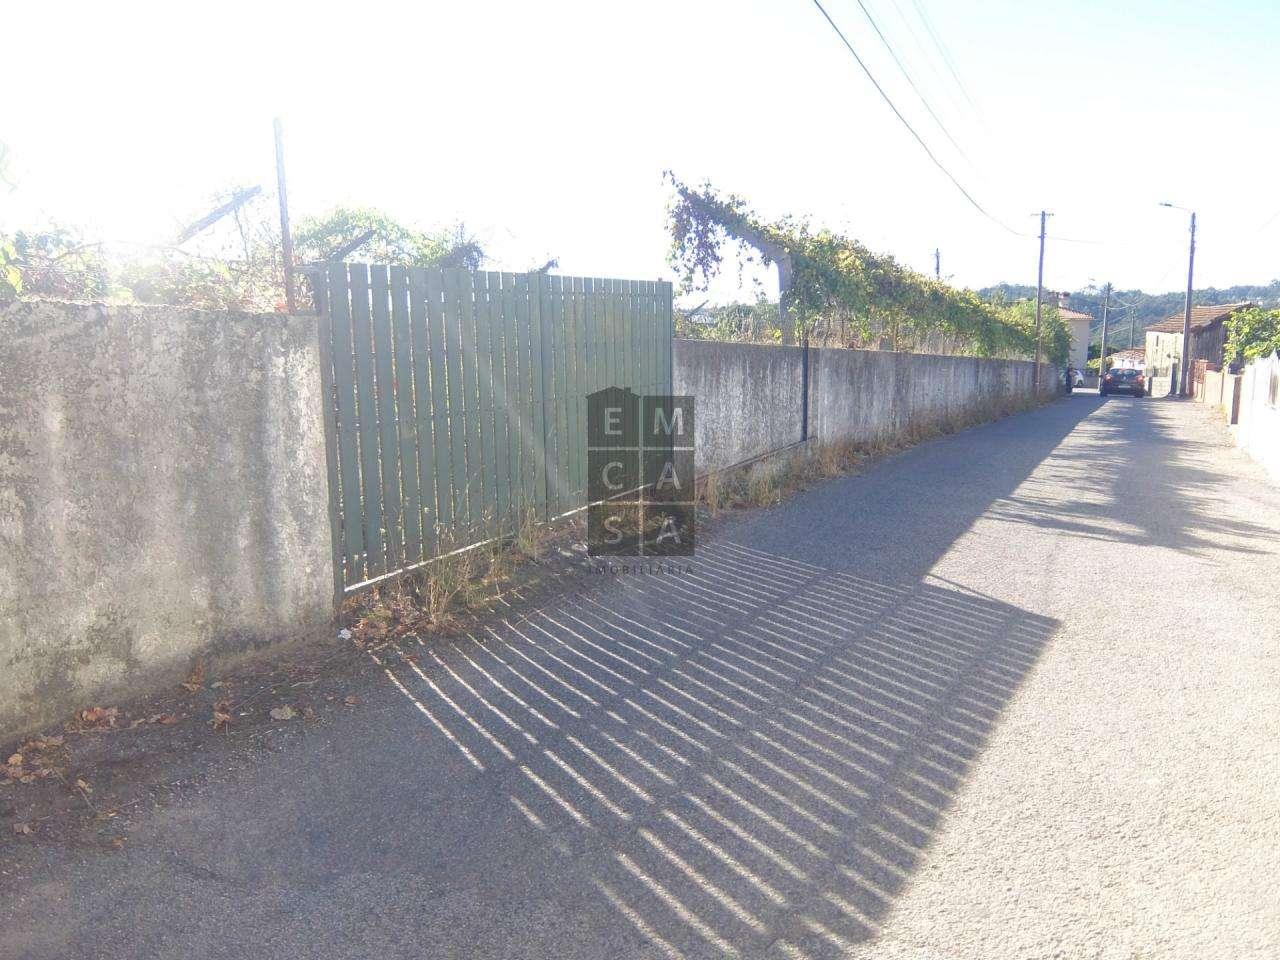 Moradia para comprar, Oliveira de Azeméis, Santiago de Riba-Ul, Ul, Macinhata da Seixa e Madail, Oliveira de Azeméis, Aveiro - Foto 25